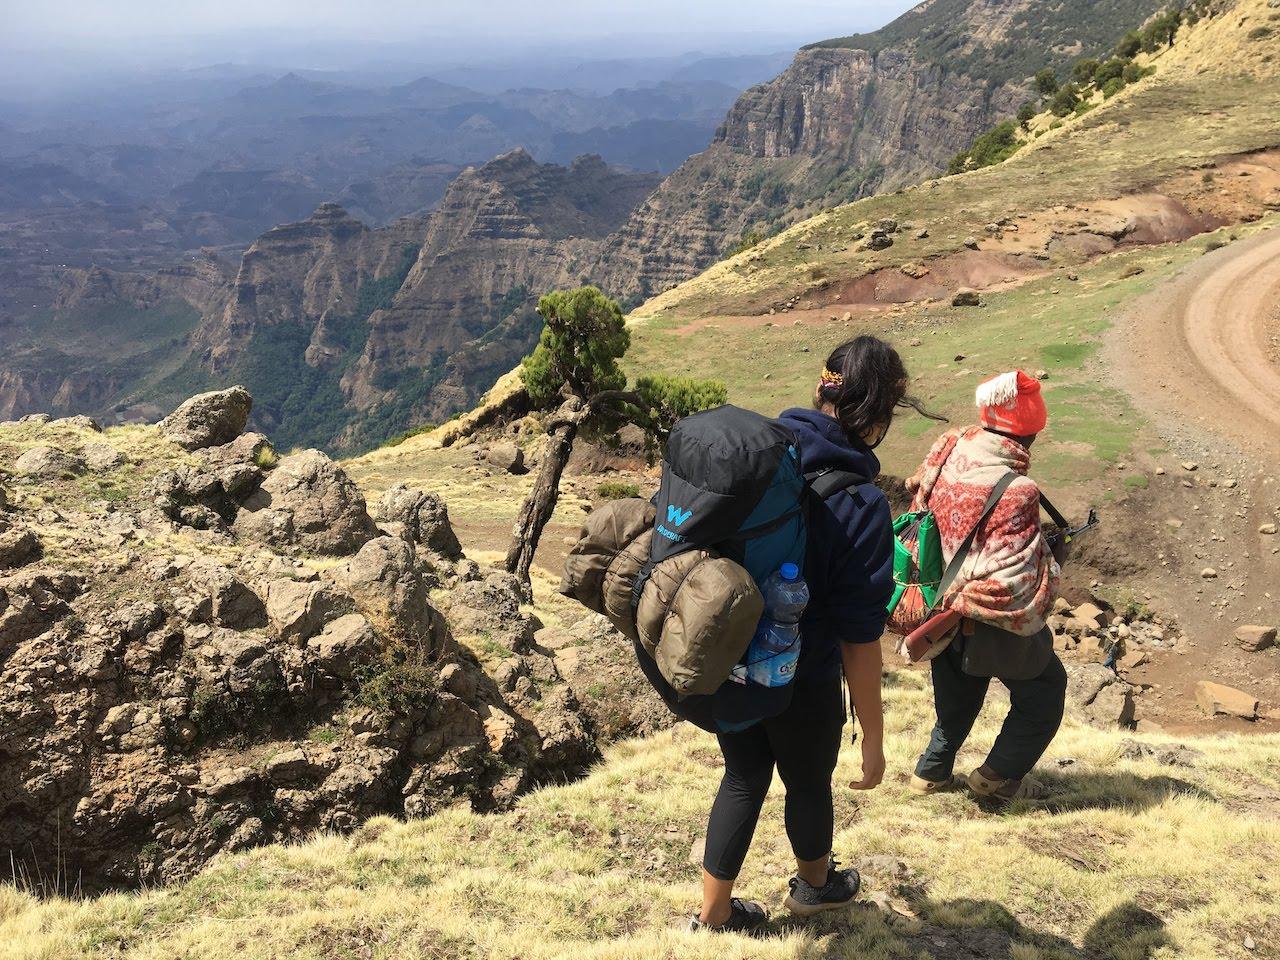 Trekking-Ethiopias-Simien-Mountains-Mafia-AK-47s-and-a-Park-at-Risk-mountain-track-descent